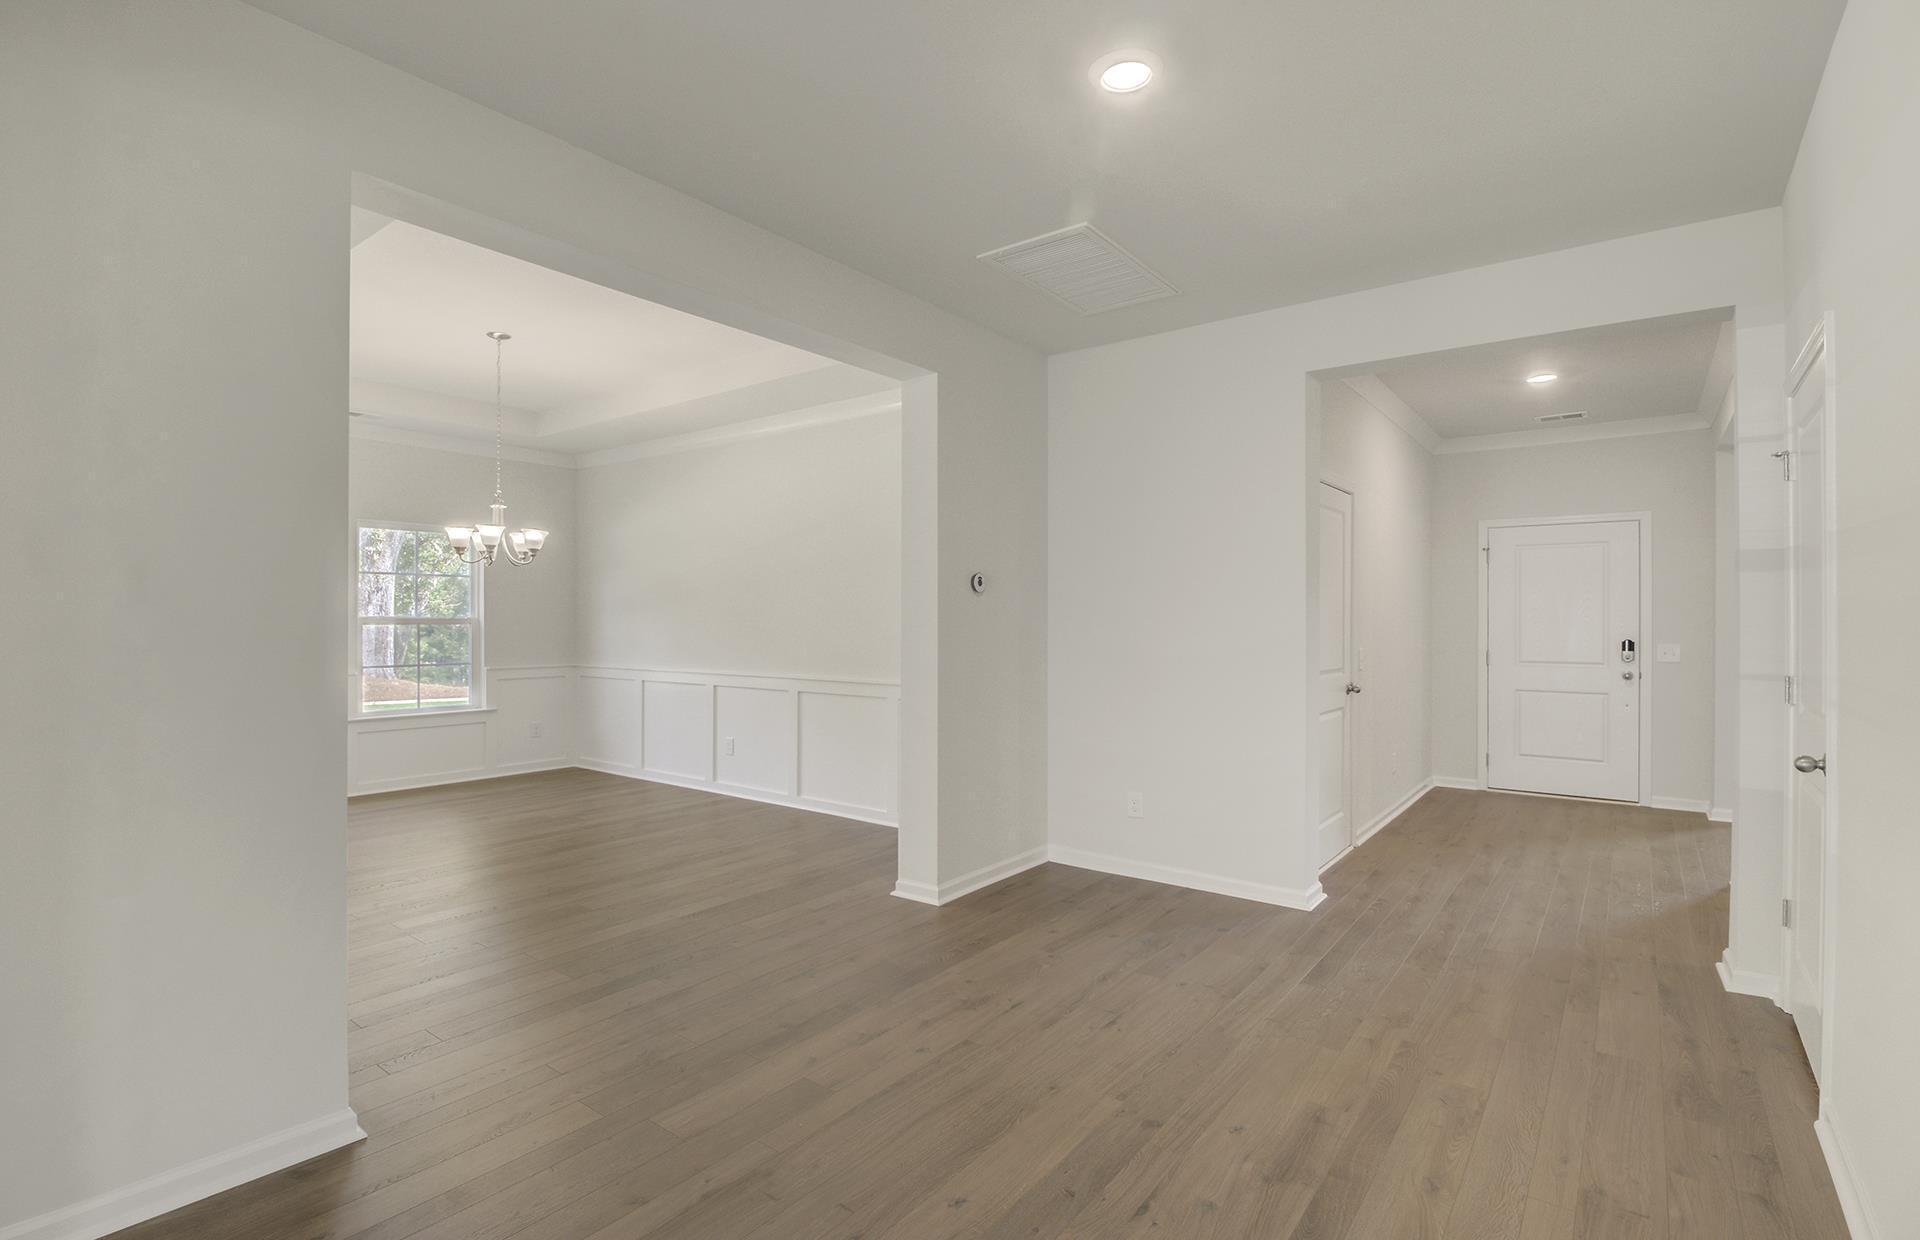 Cane Bay Plantation Homes For Sale - 205 Granton Edge, Summerville, SC - 7